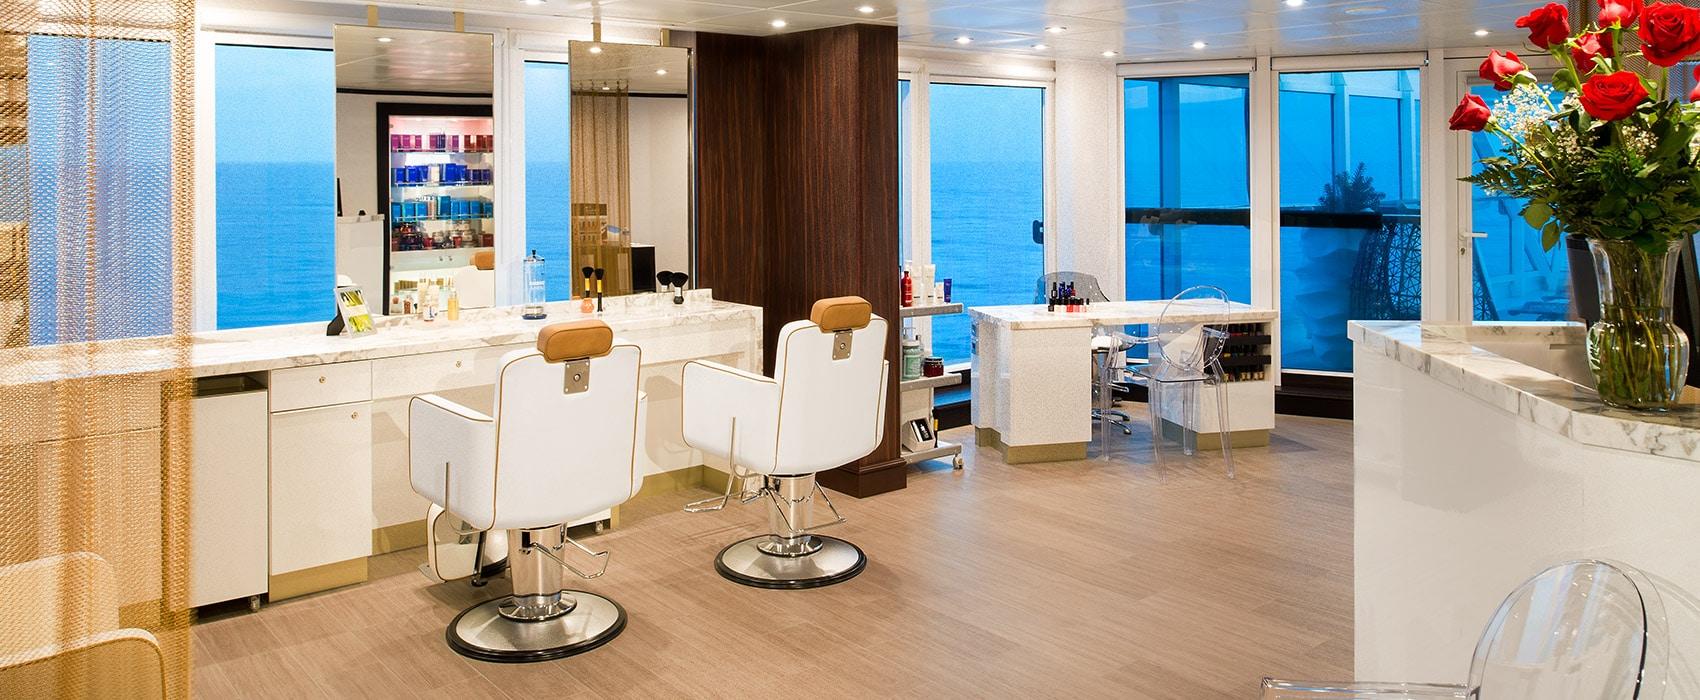 Desire Venice Cruise | Additional Facilities